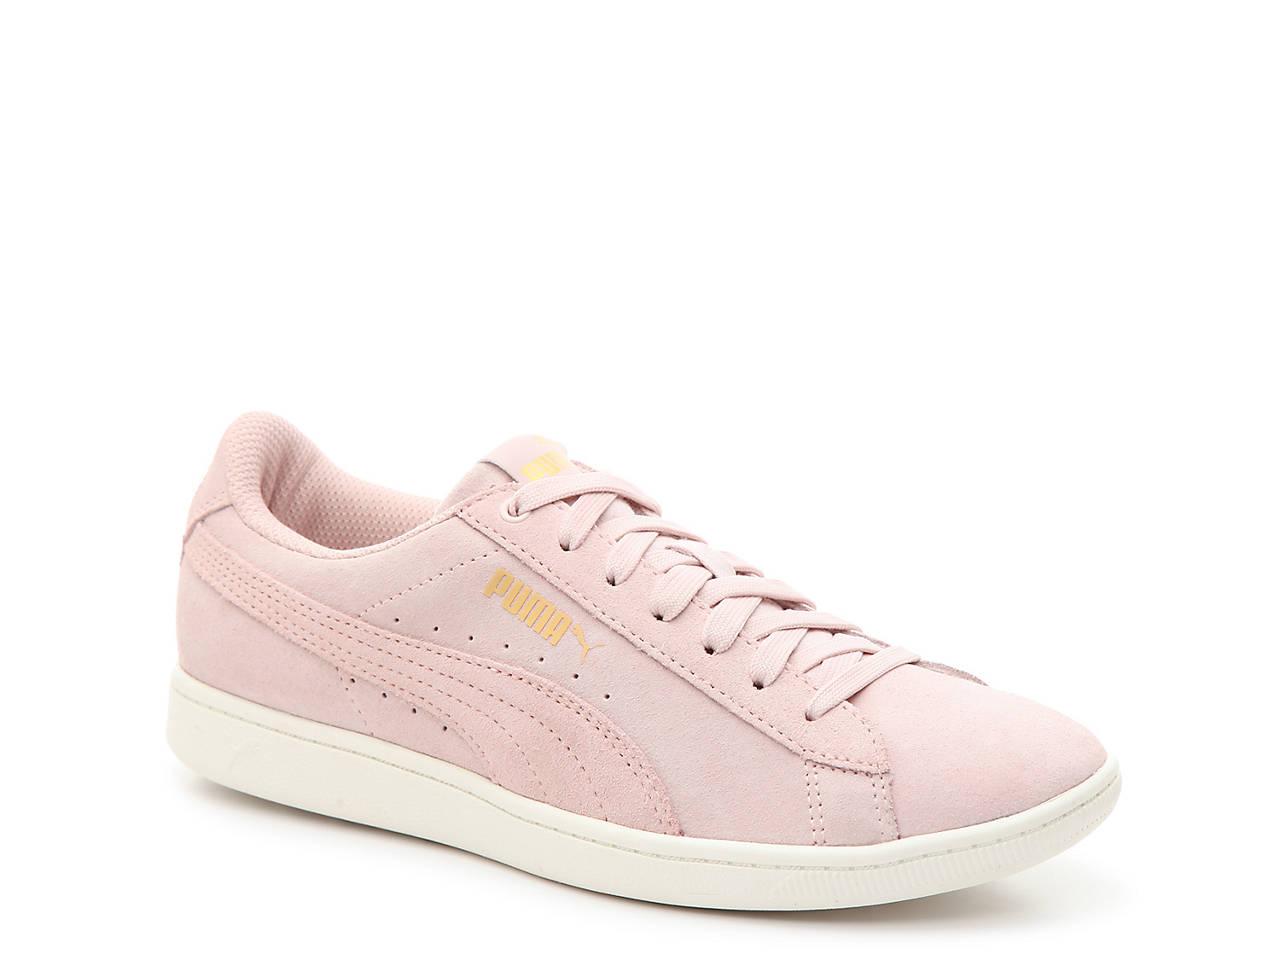 puma sneakers womens pink